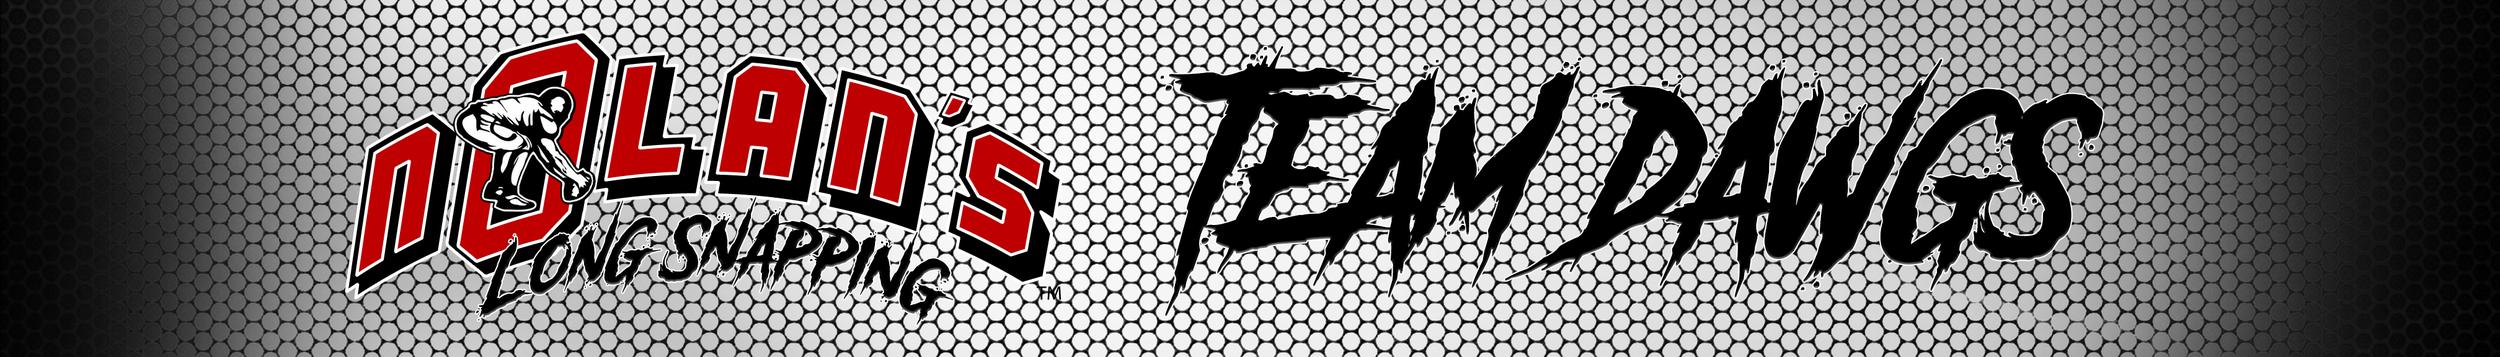 Nolan's-TEAM-Dawgs-Banner.png